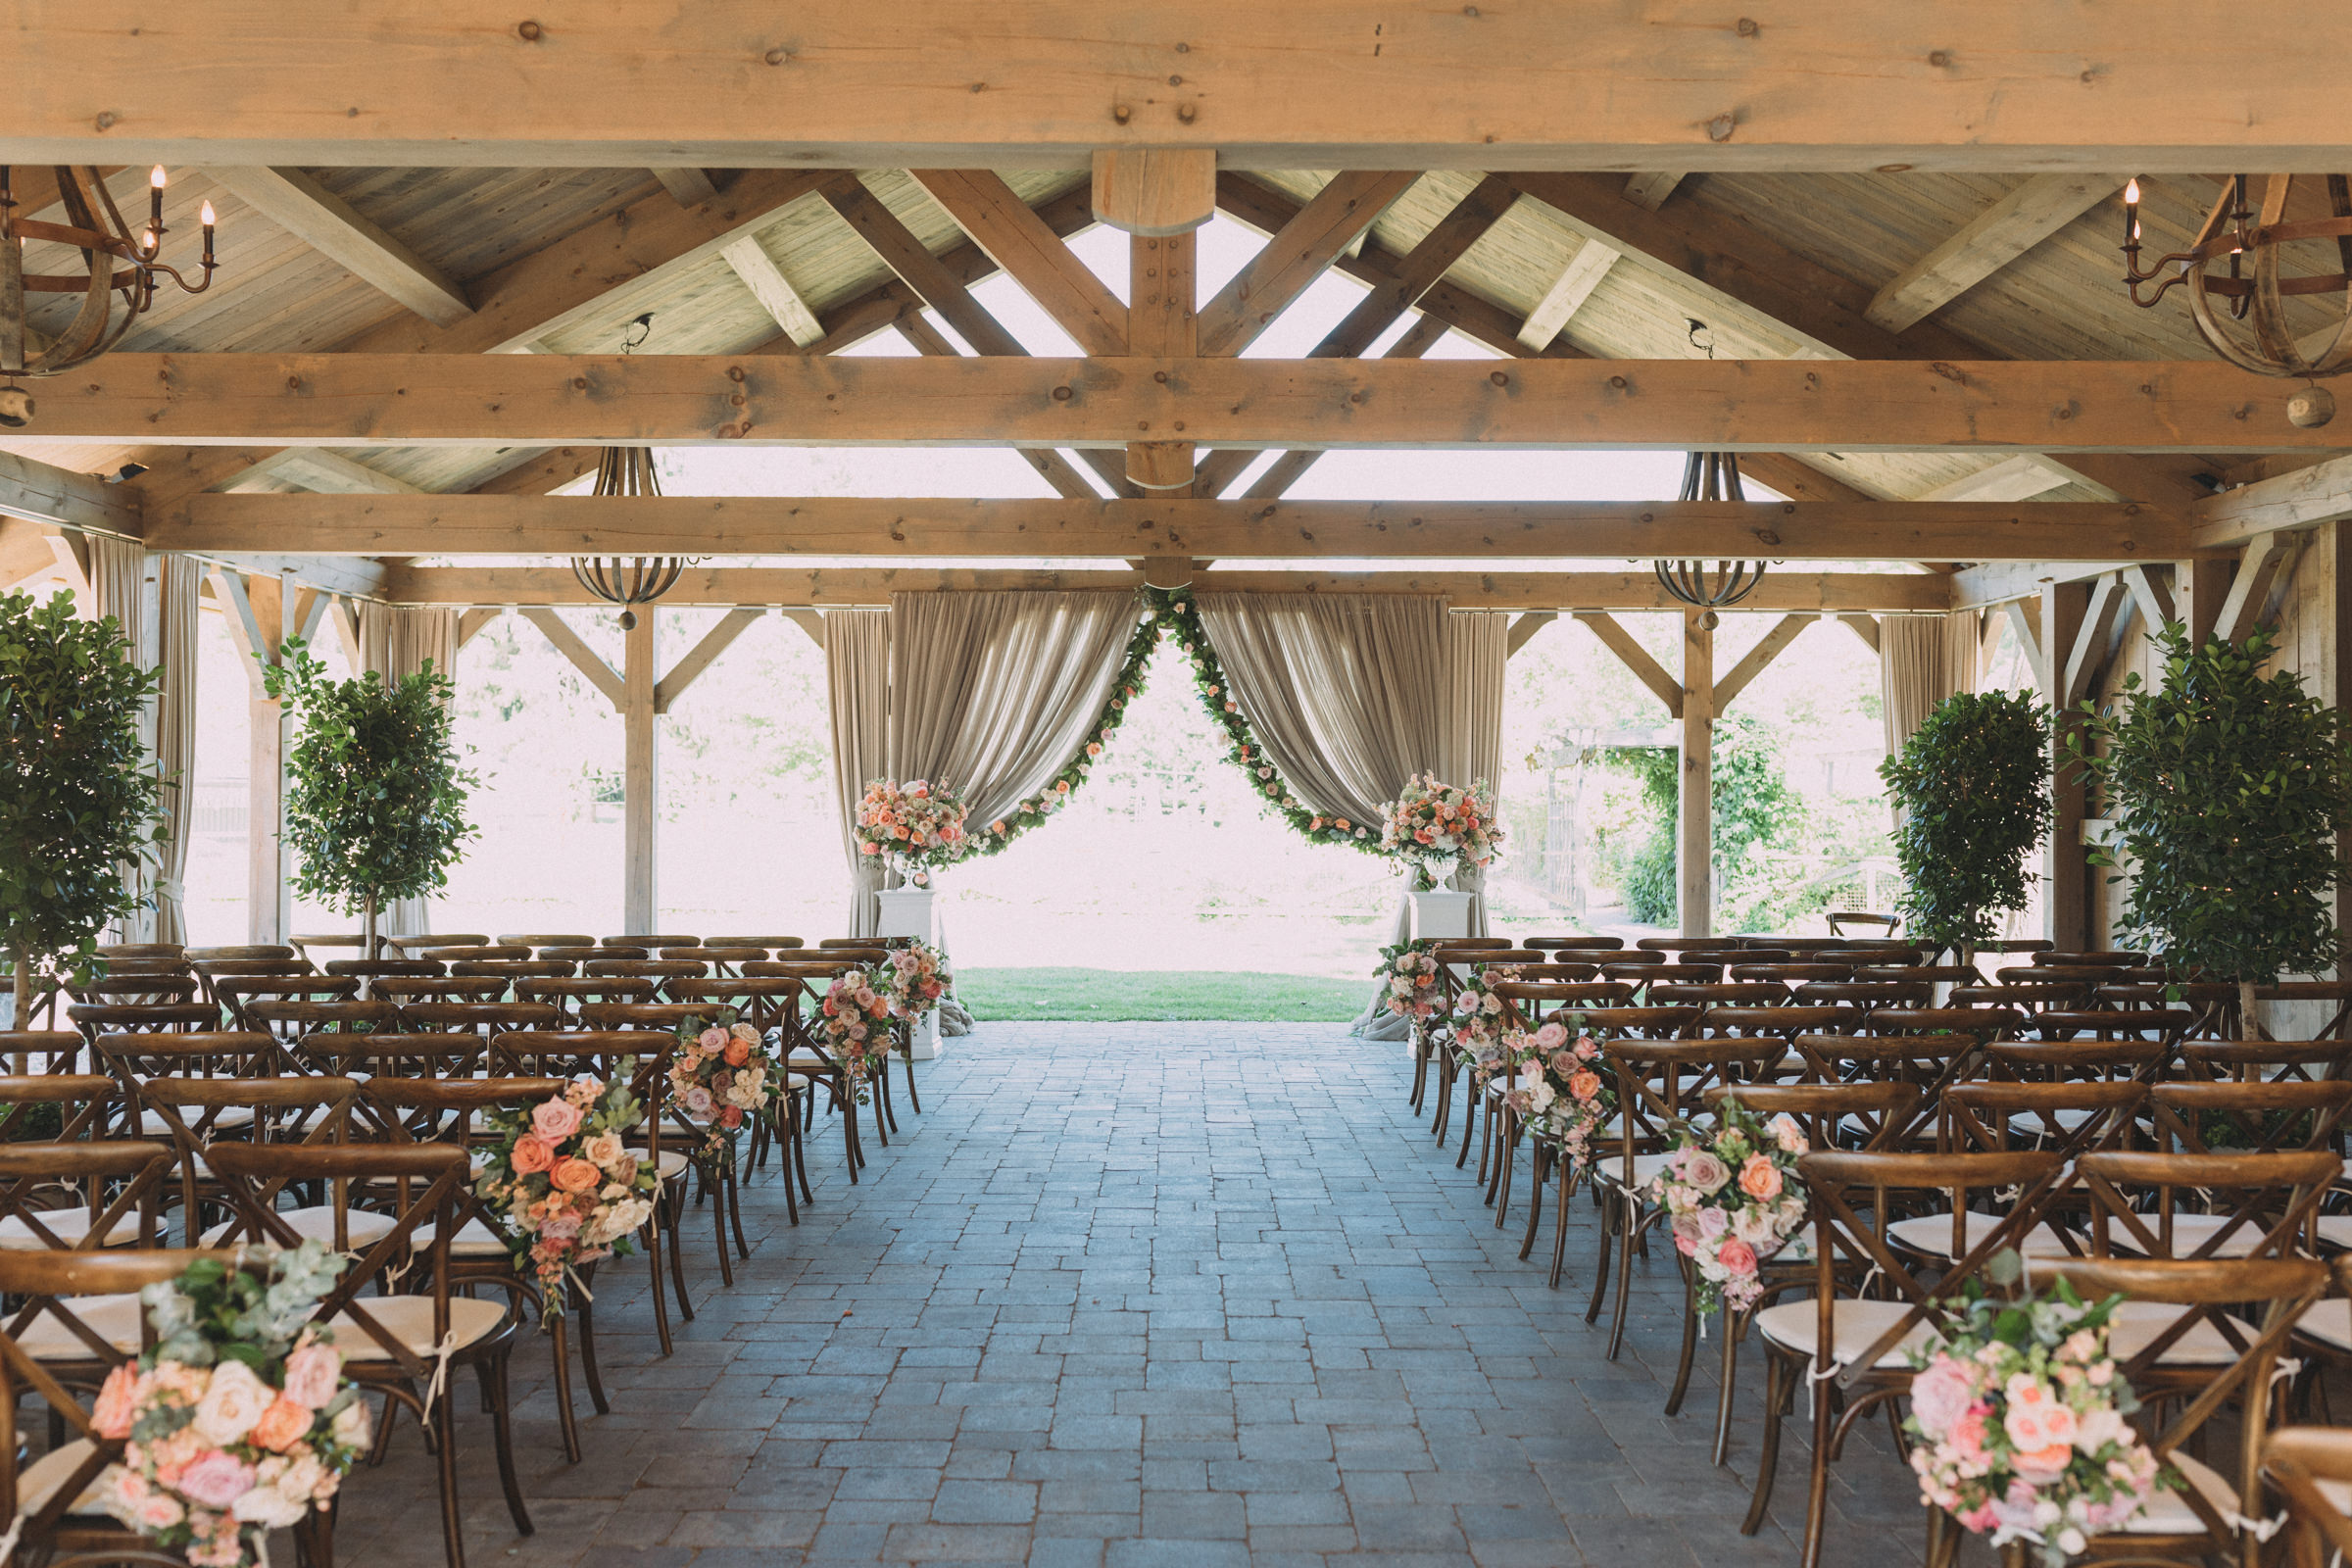 Langdon-Hall-wedding-photography-Cambridge-by-Sam-Wong-of-Visual-Cravings_Sarah-Ryan_27.jpg